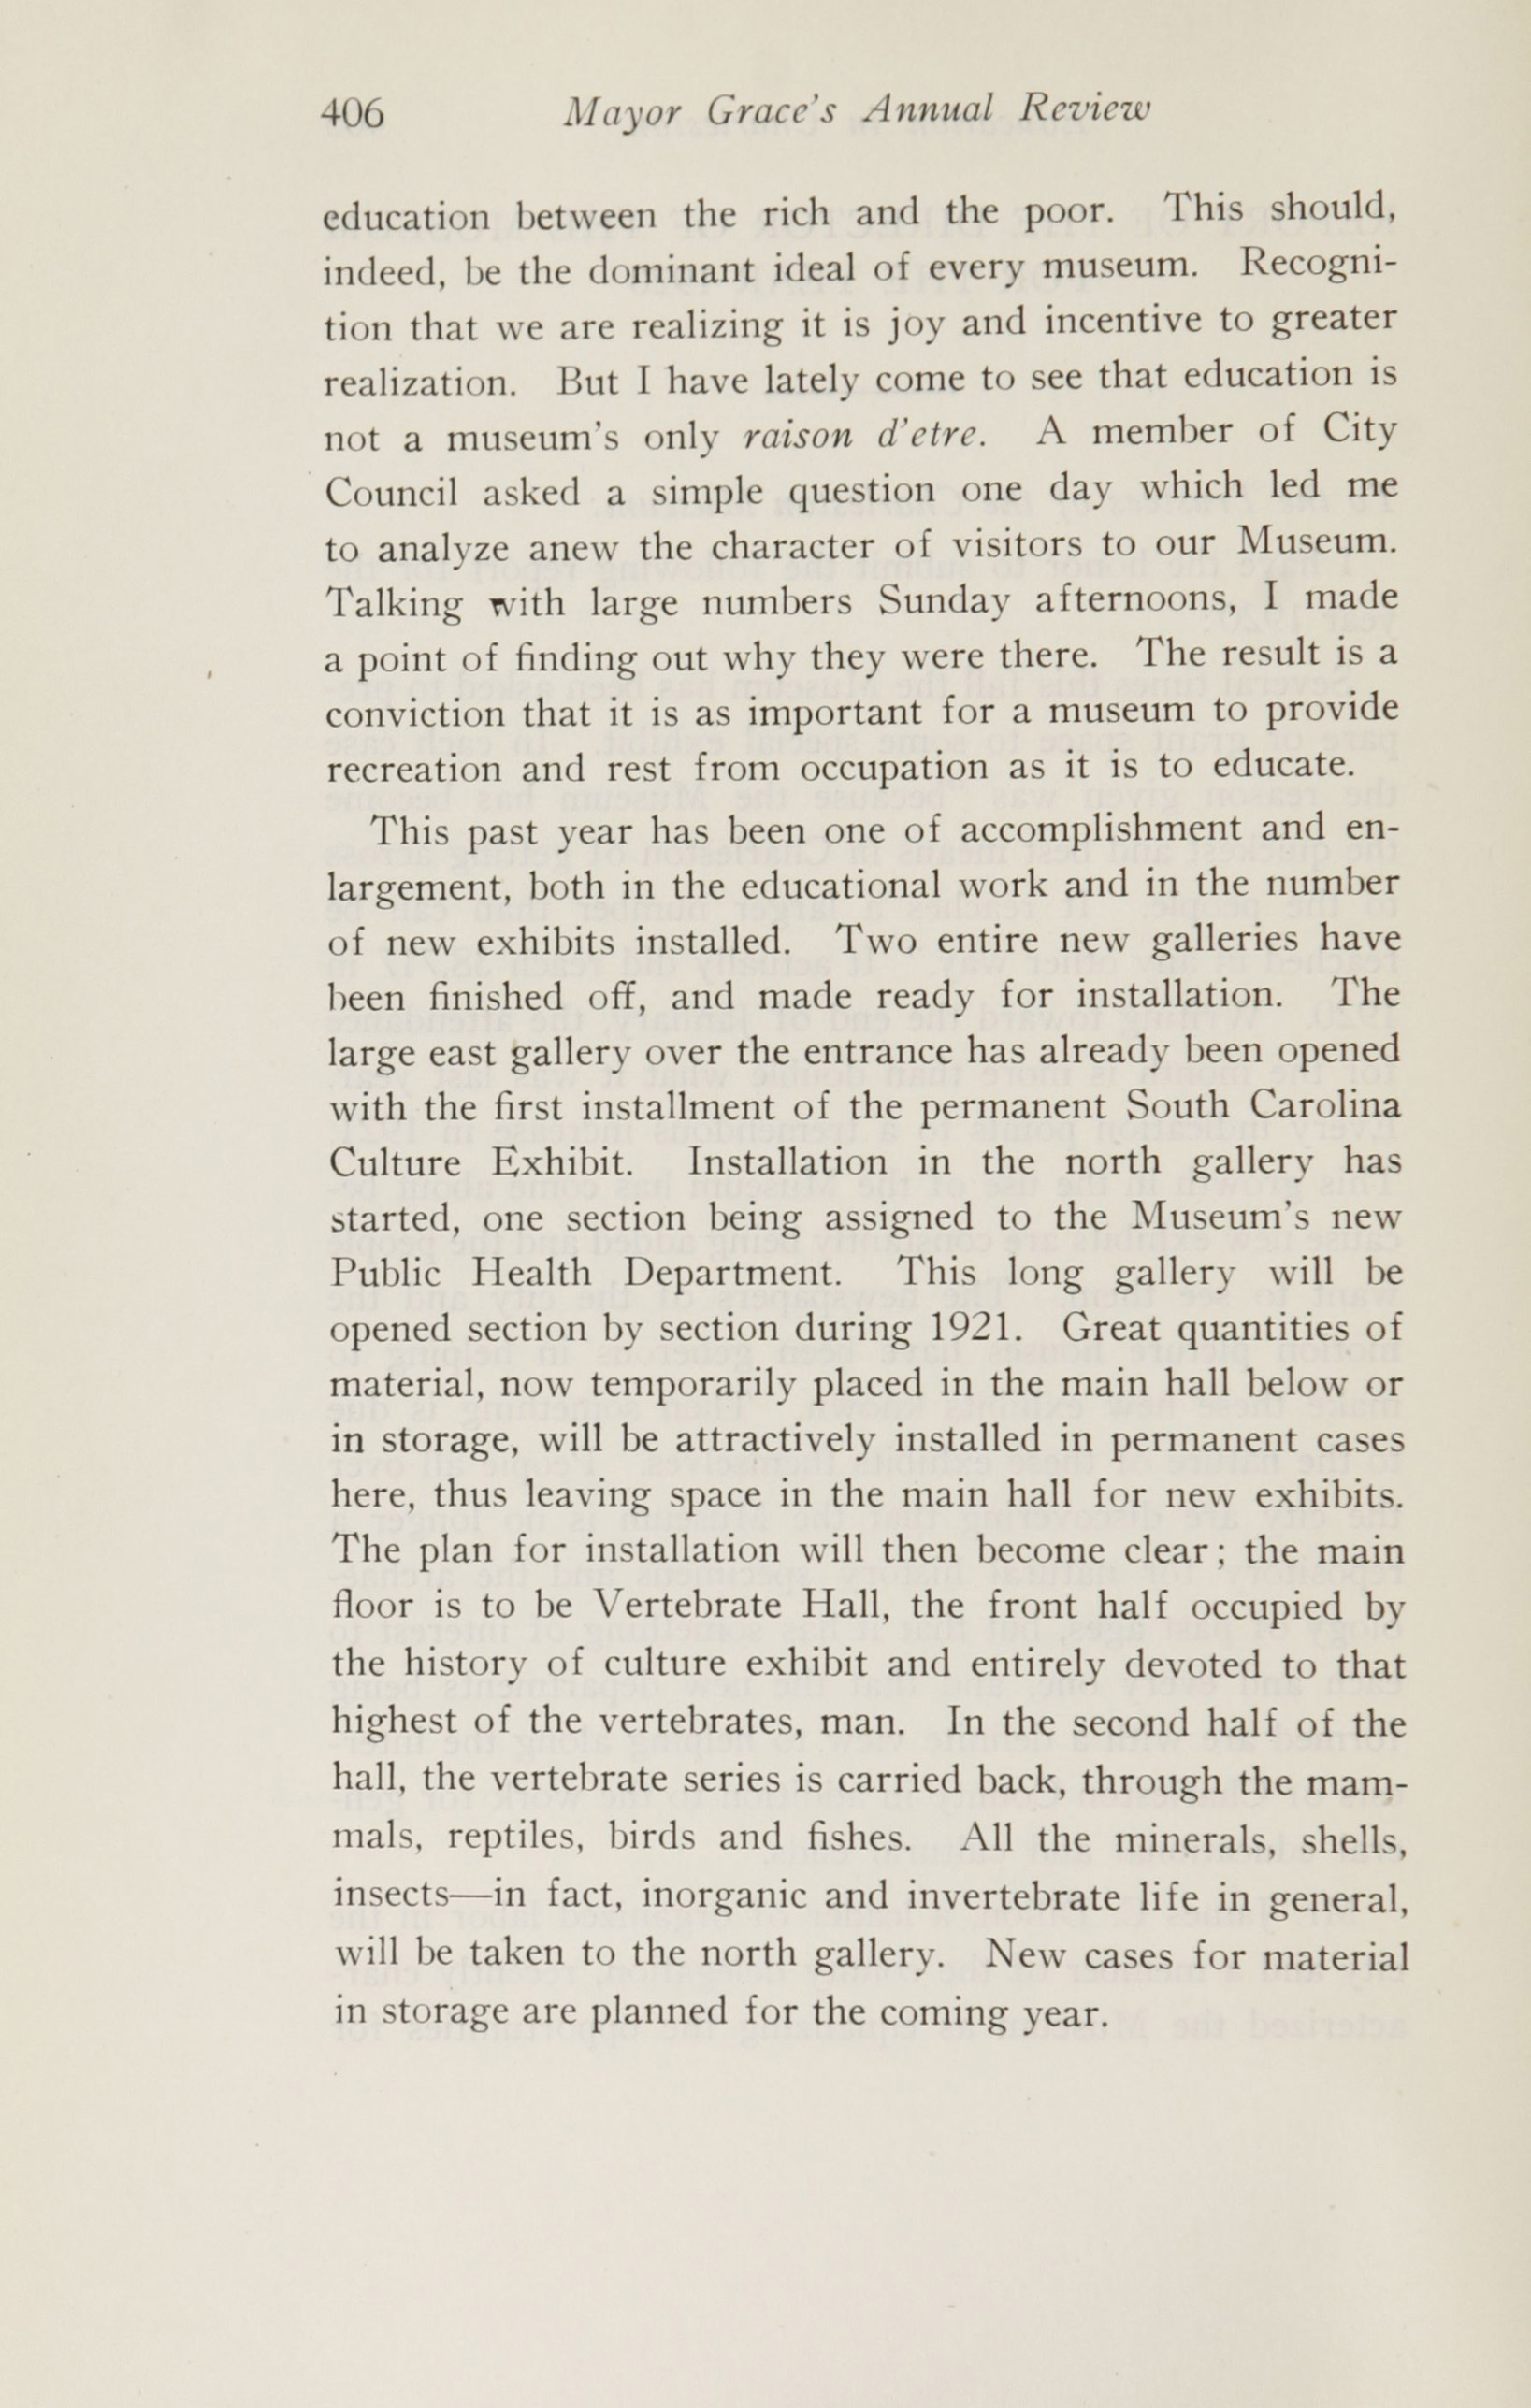 Charleston Yearbook, 1920, page 406